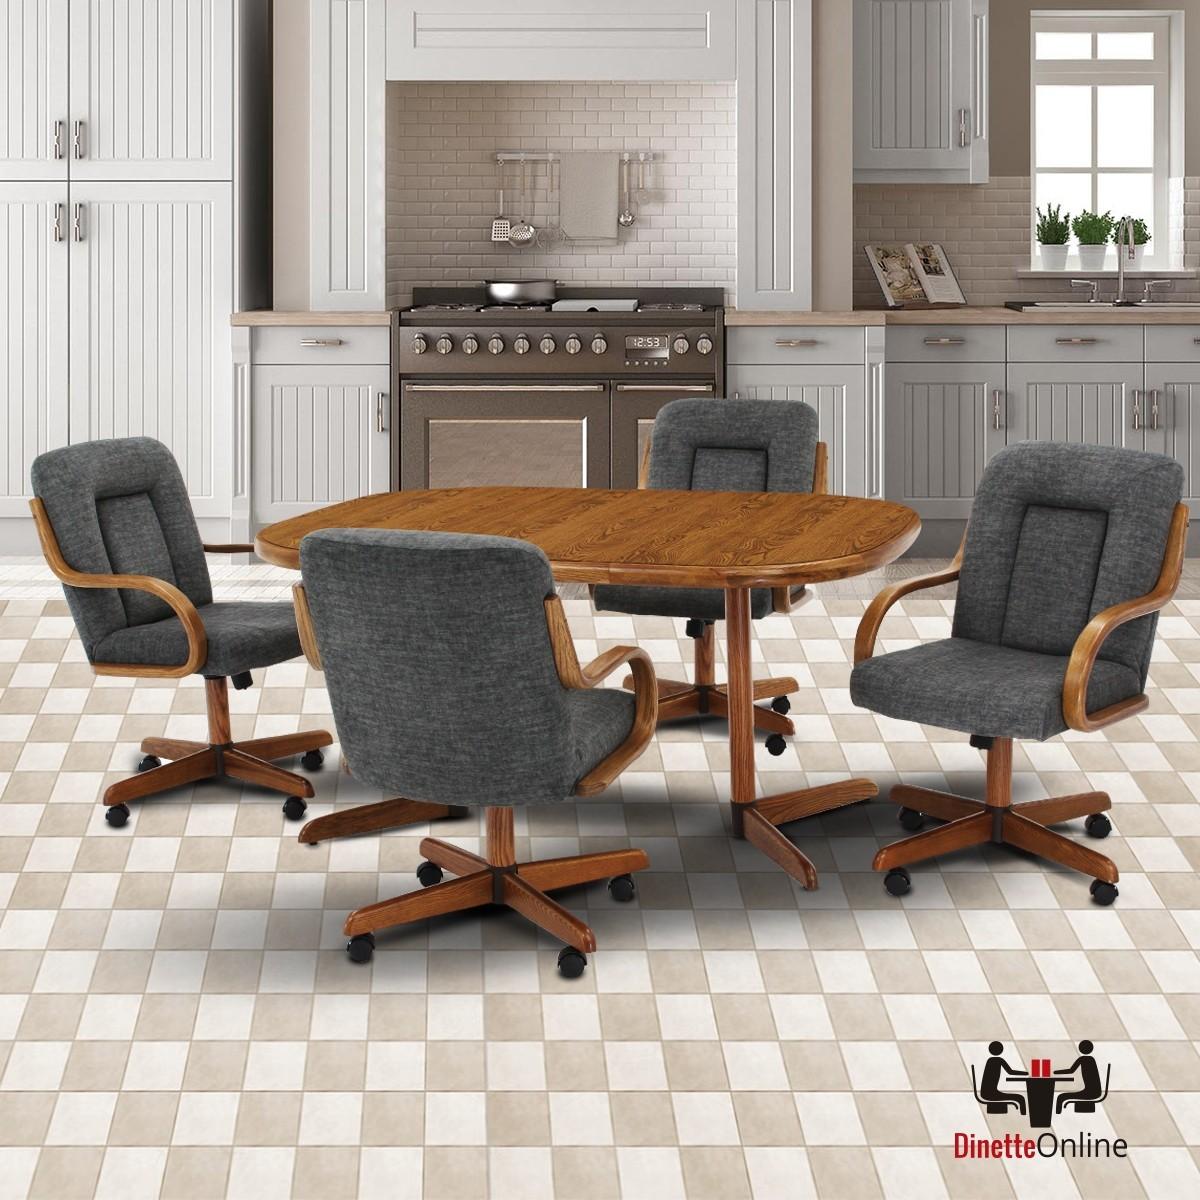 Douglas Furniture: Douglas Furniture Liz 5 PC Caster Dining Set